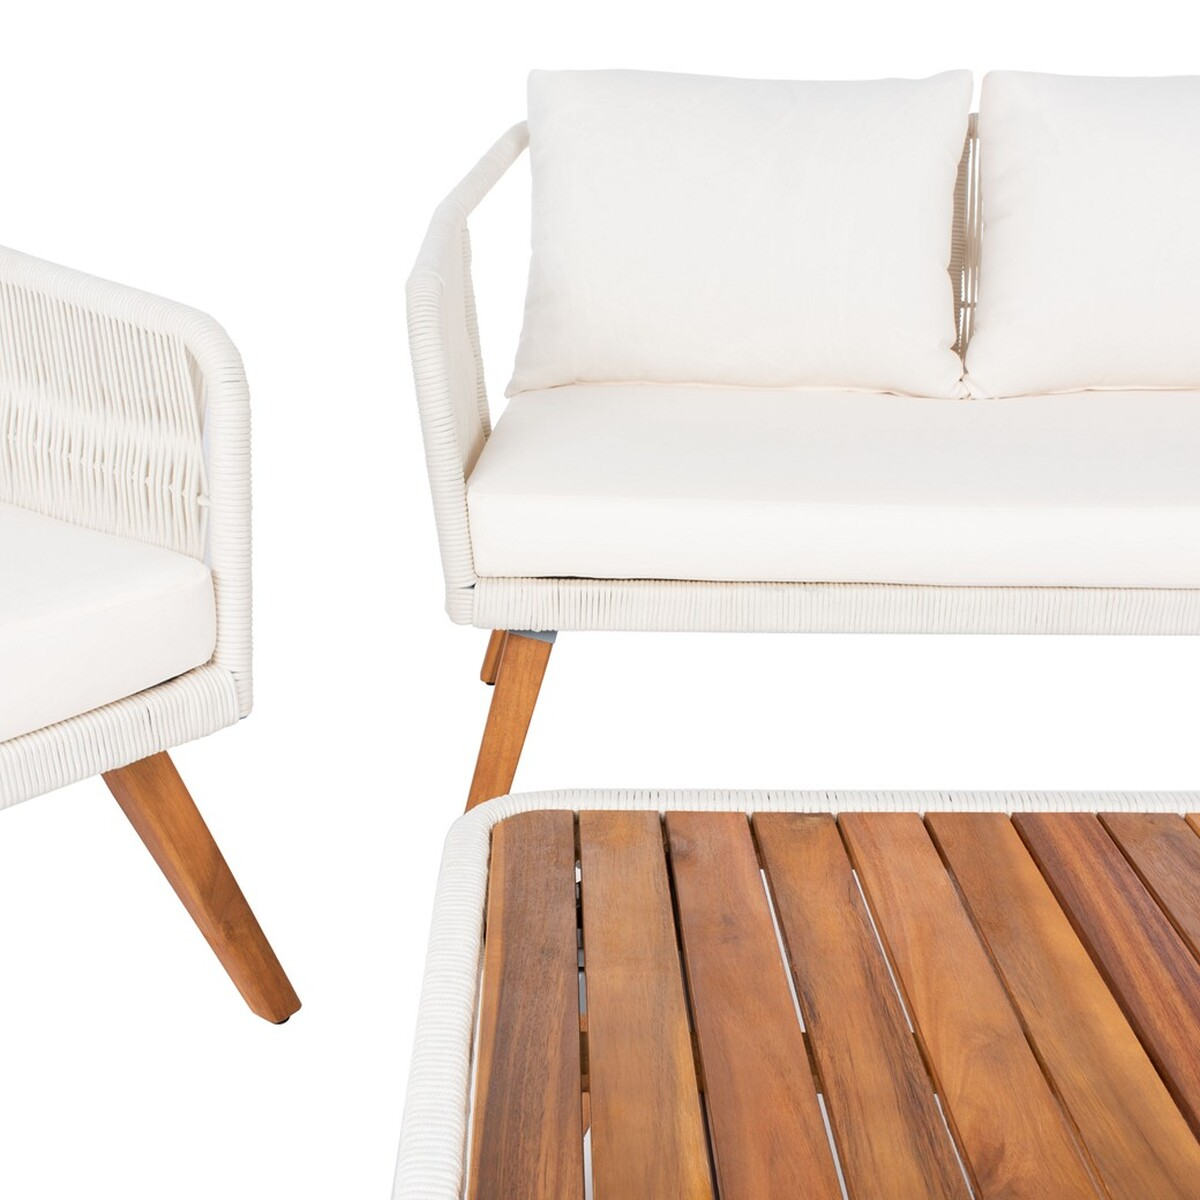 PAT7049D Patio Sets - 4 Piece - Furniture by Safavieh on Safavieh Raldin id=25942